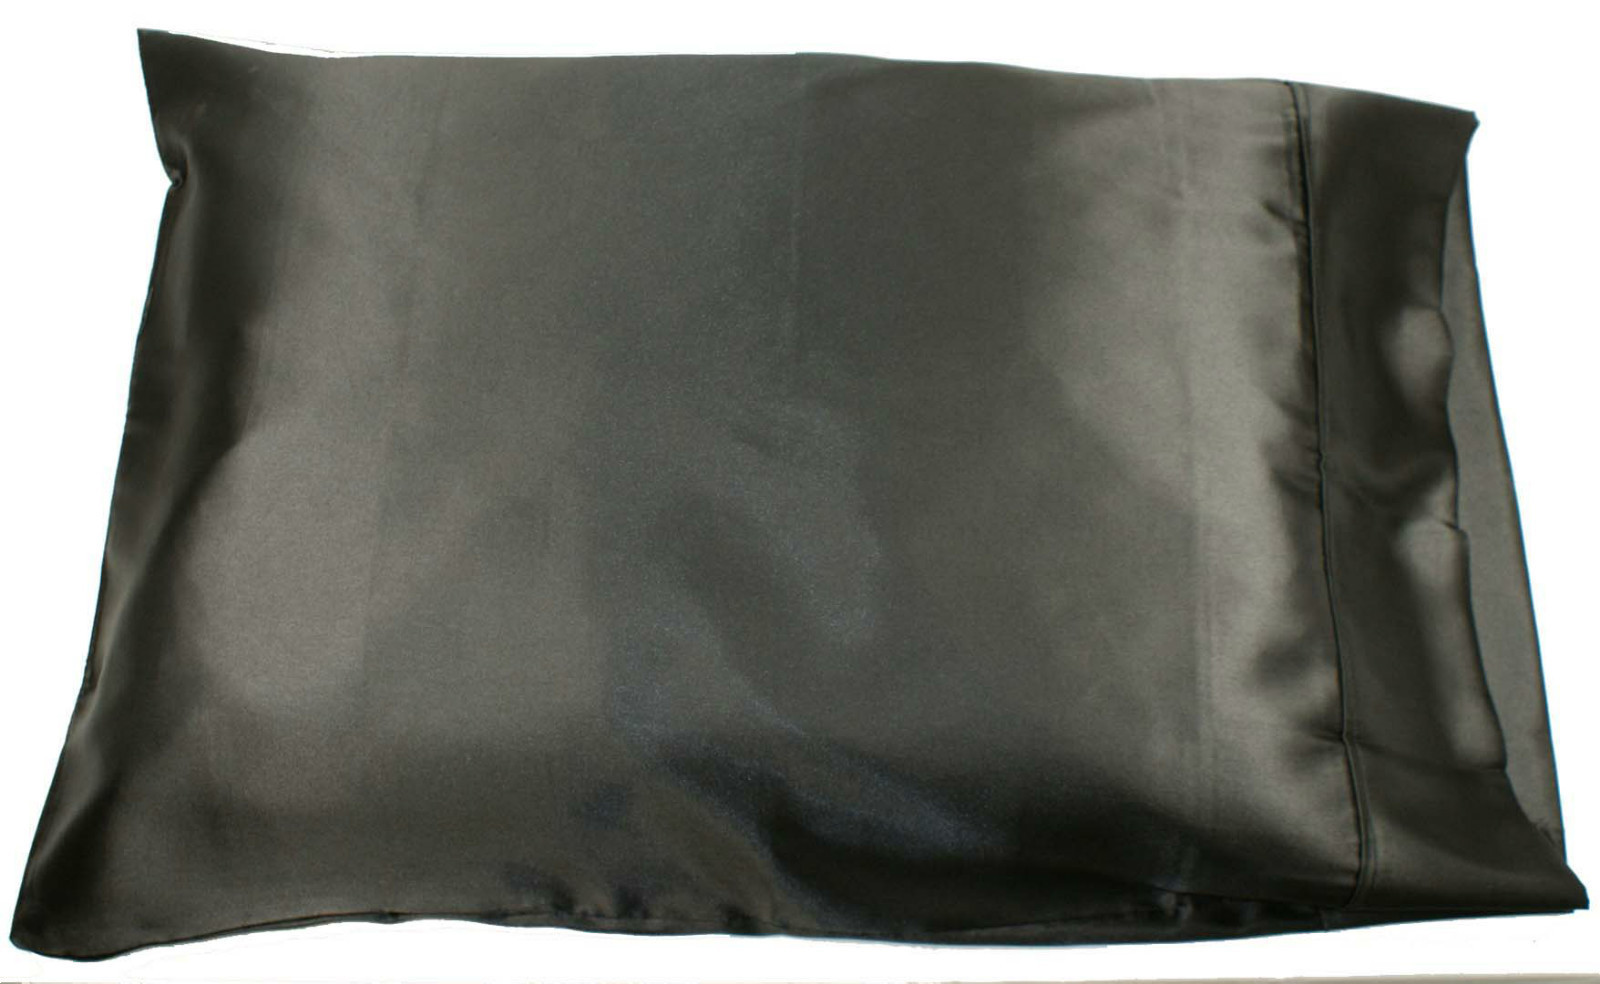 1pc New Queen/Standard Size Silky Satin Pillow Case